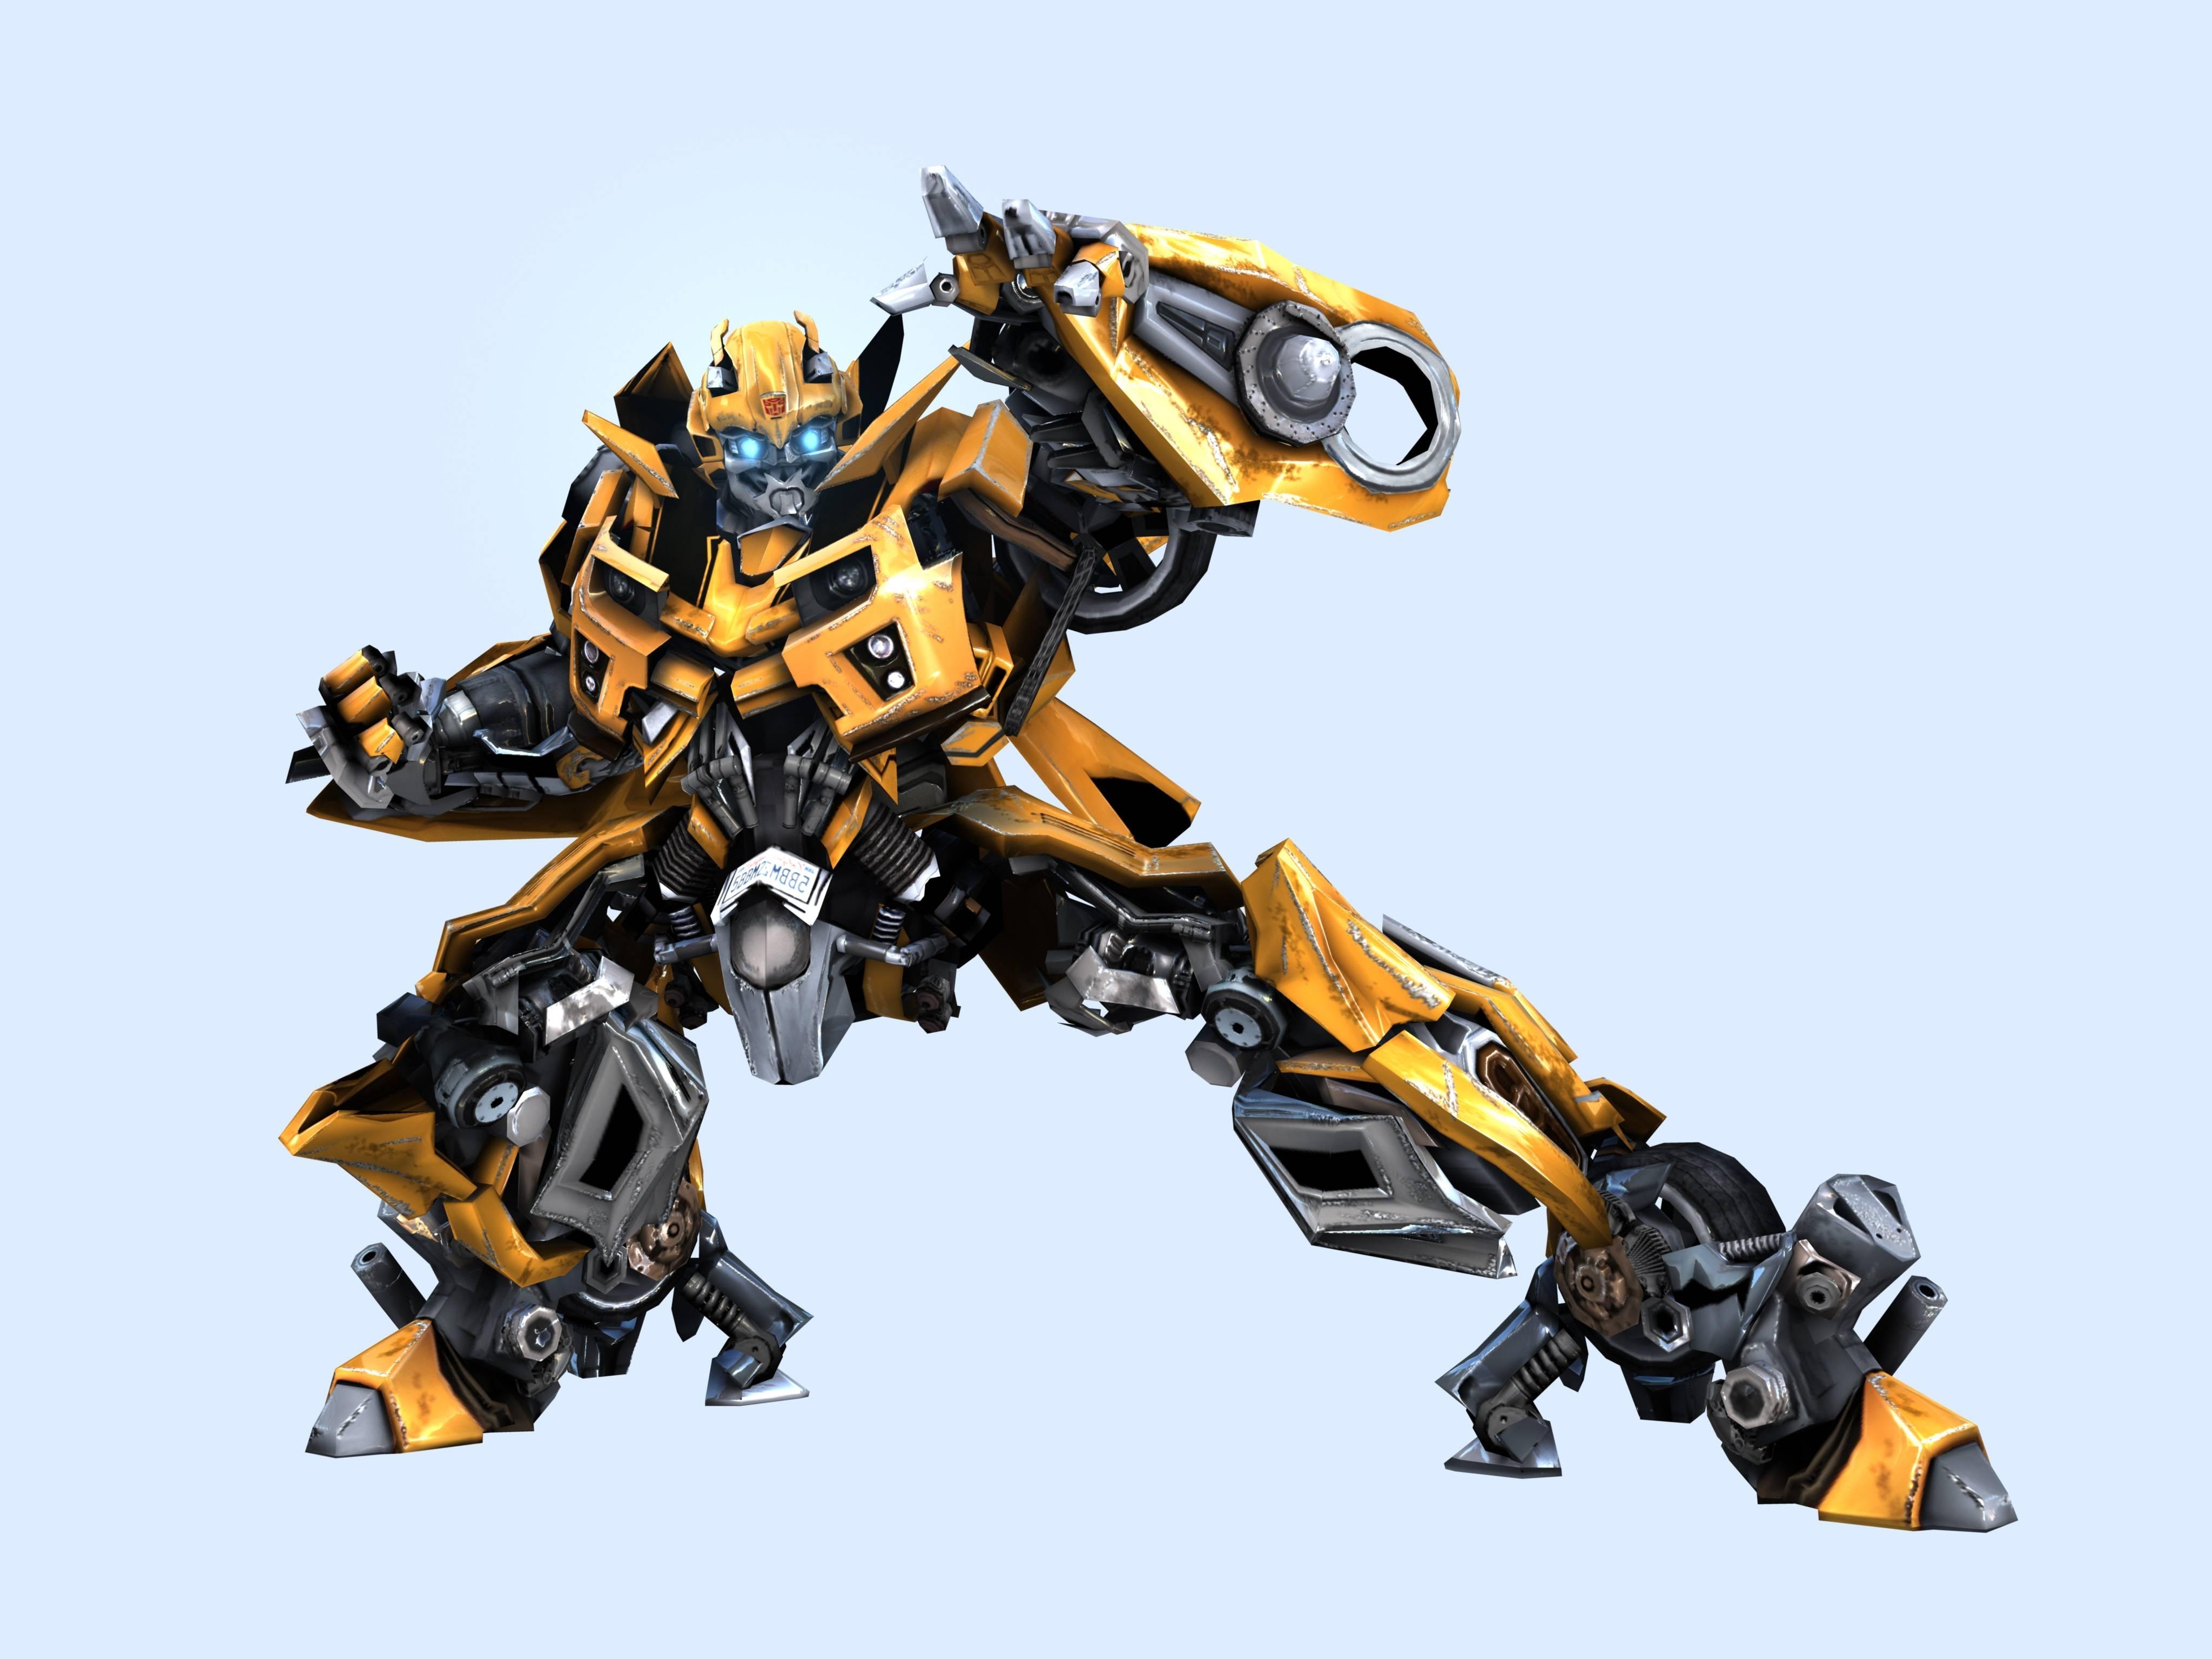 transformers 2 bumblebee wallpapers - wallpaper cave